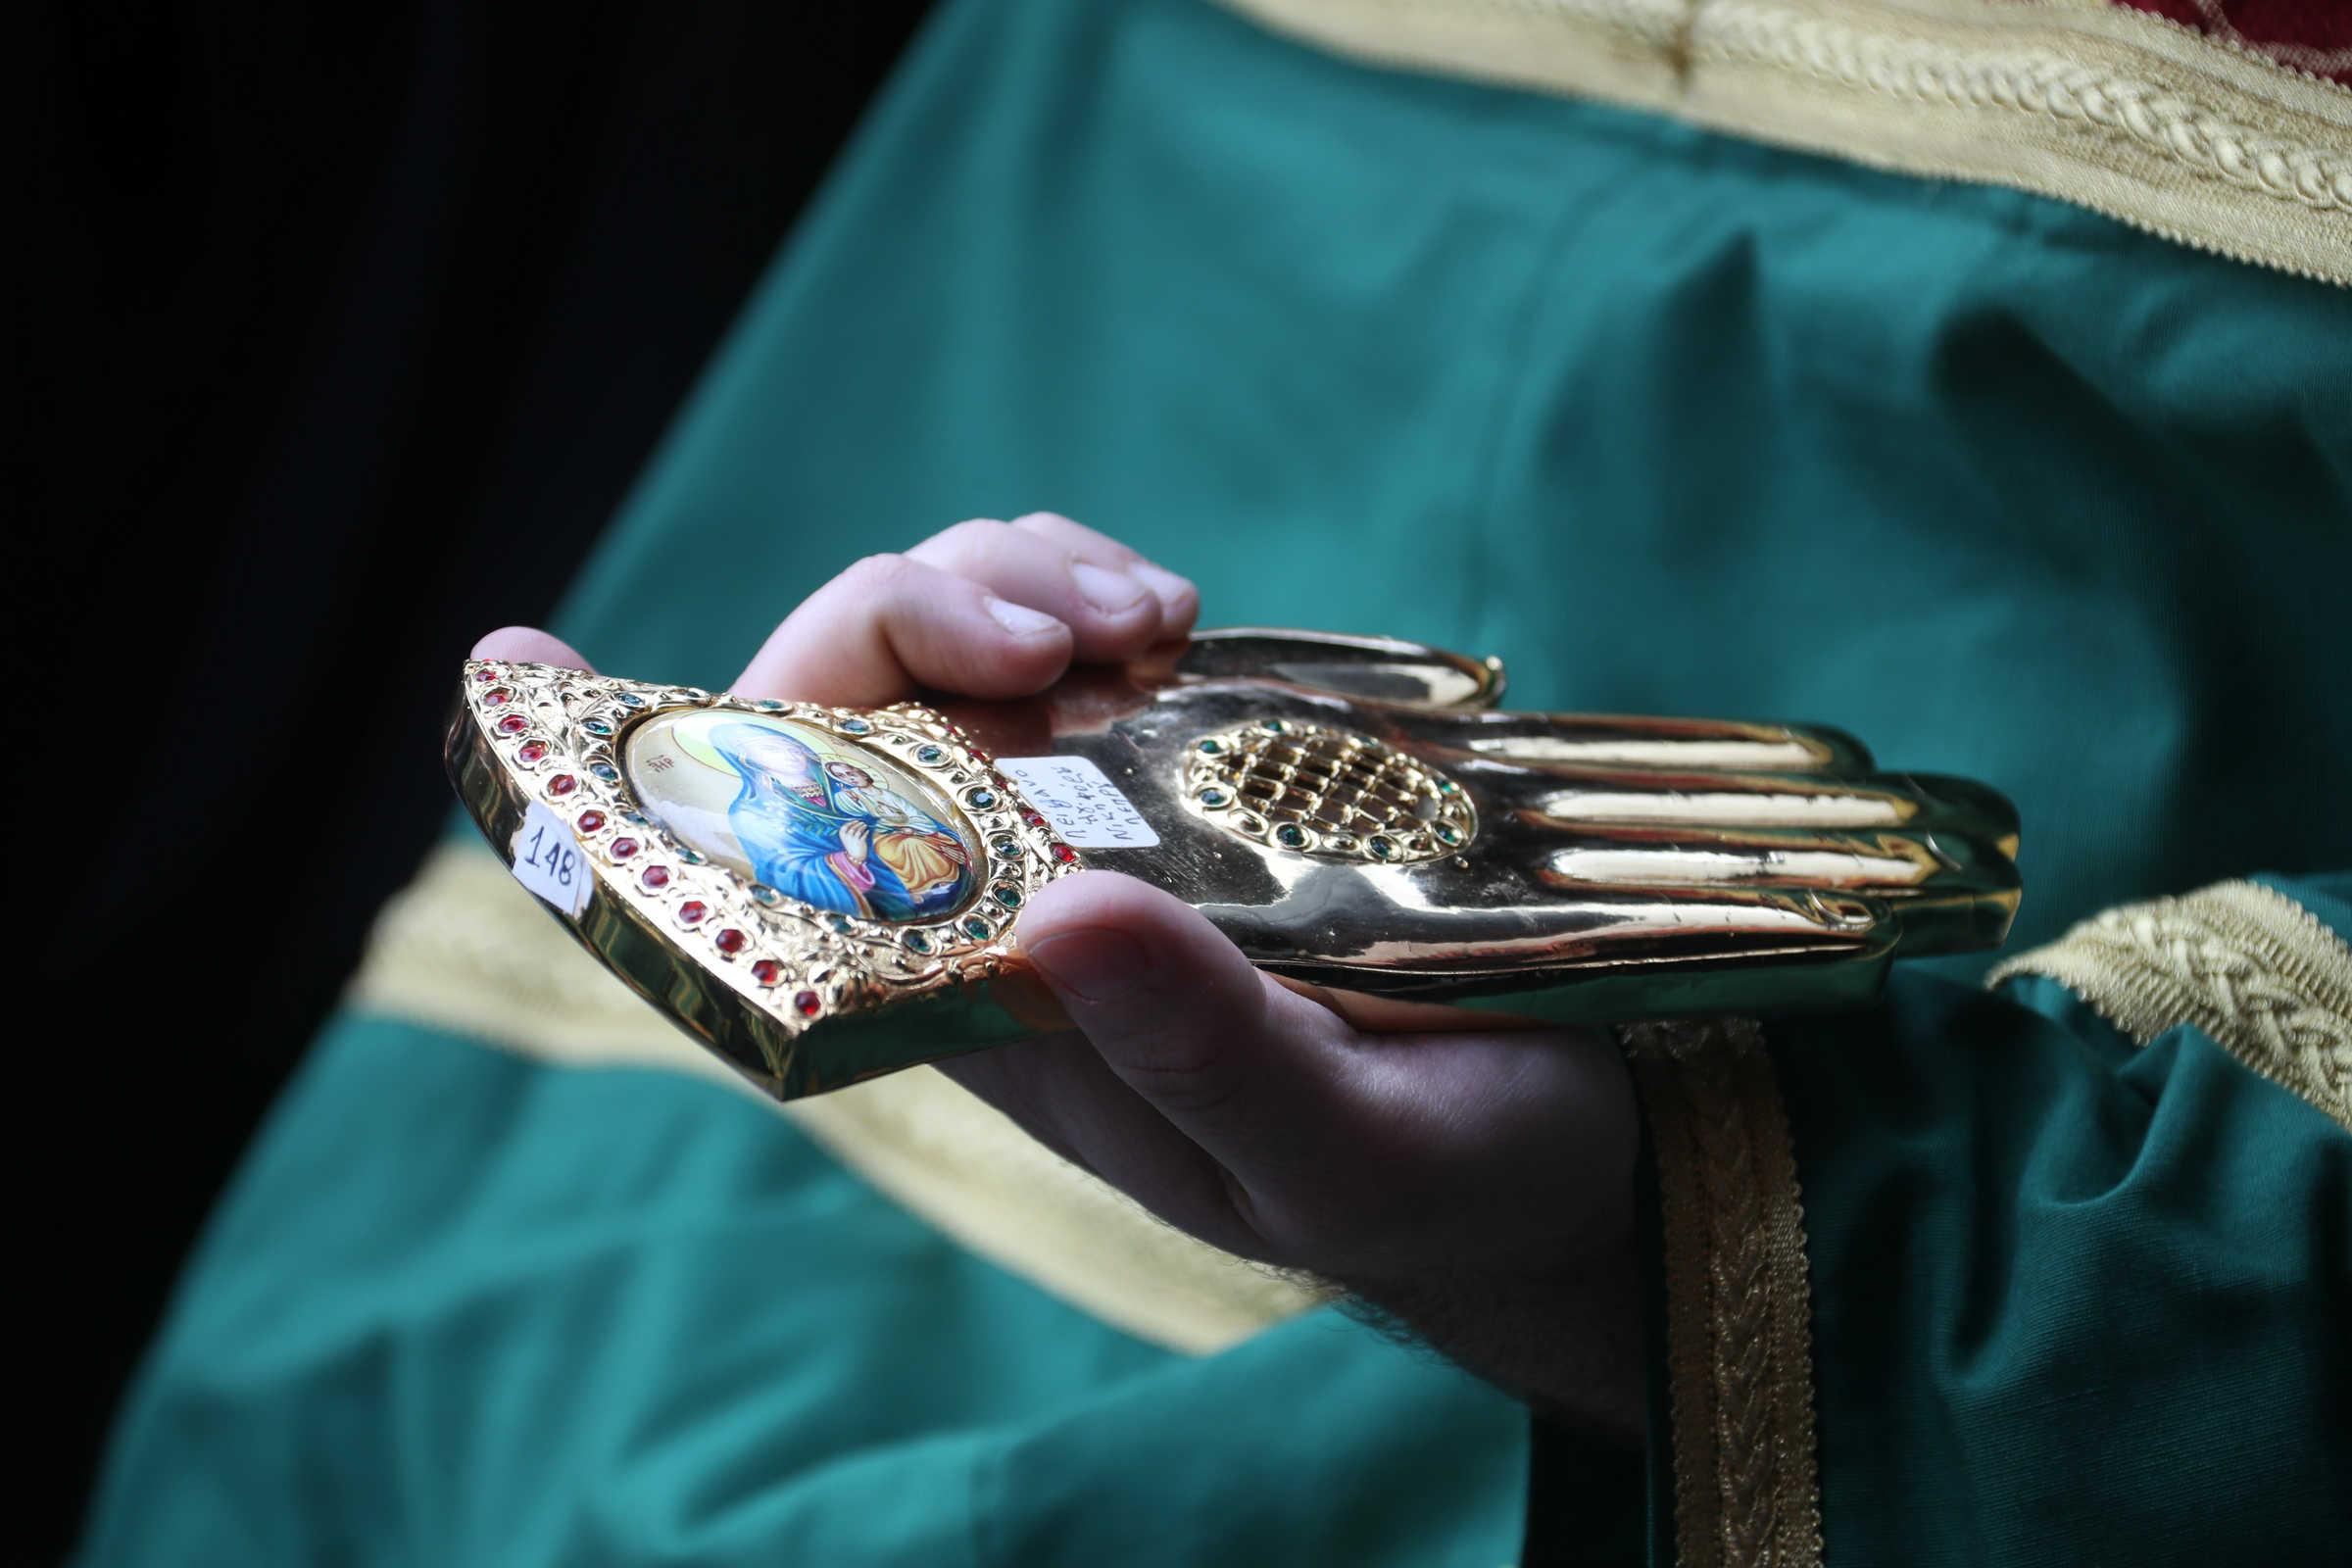 Cine sunt sfinții protectori? (Sf. Haralambie, Sf. Nichifor Leprosul, Sf. Corona)